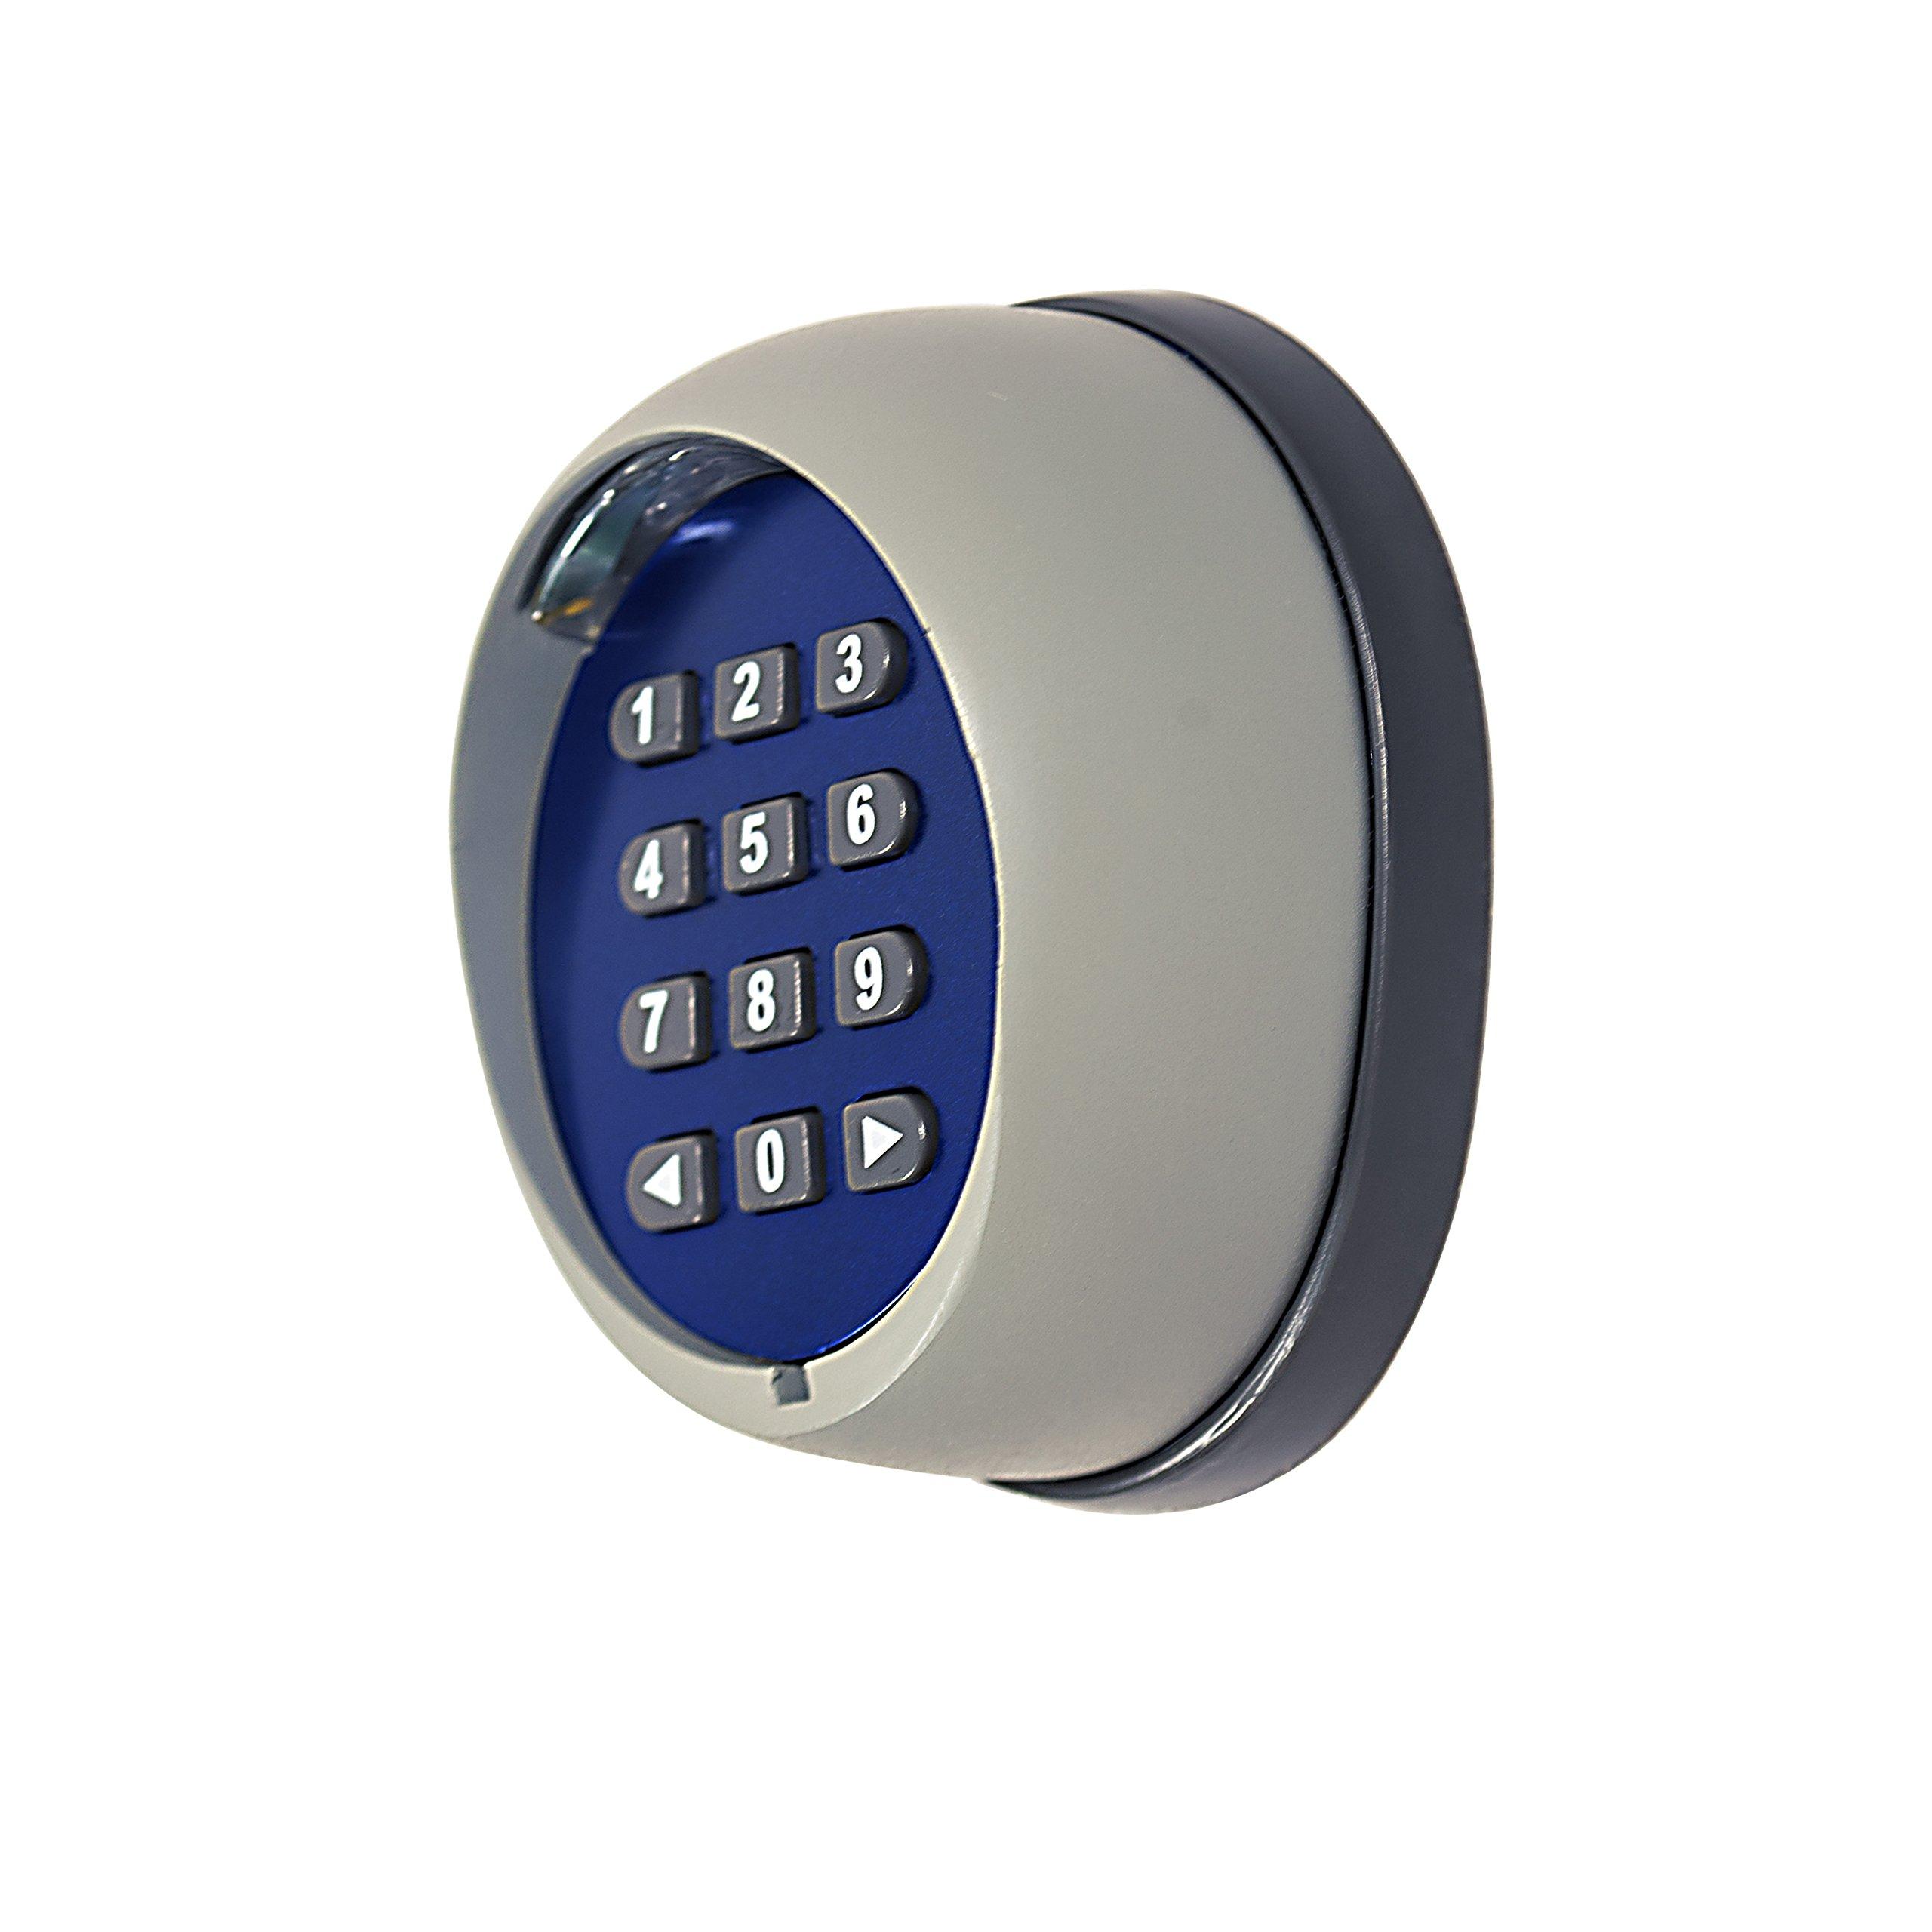 ALEKO LM171 Wireless Security Keypad Remote Operator Panel for AC/AR1400 Gate Opener